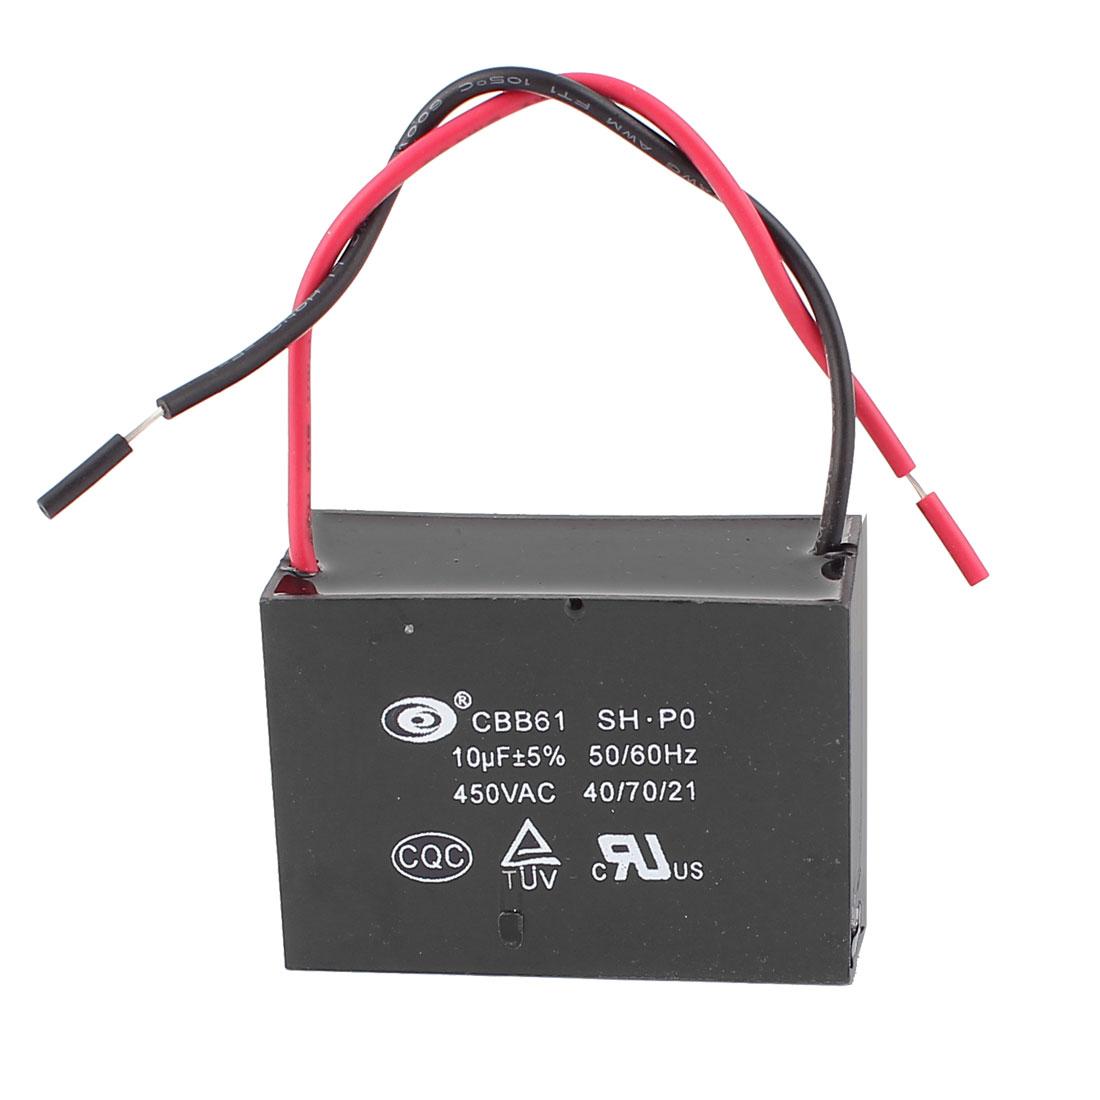 10uF AC 450V Motor Running Metallized Capacitor CBB61